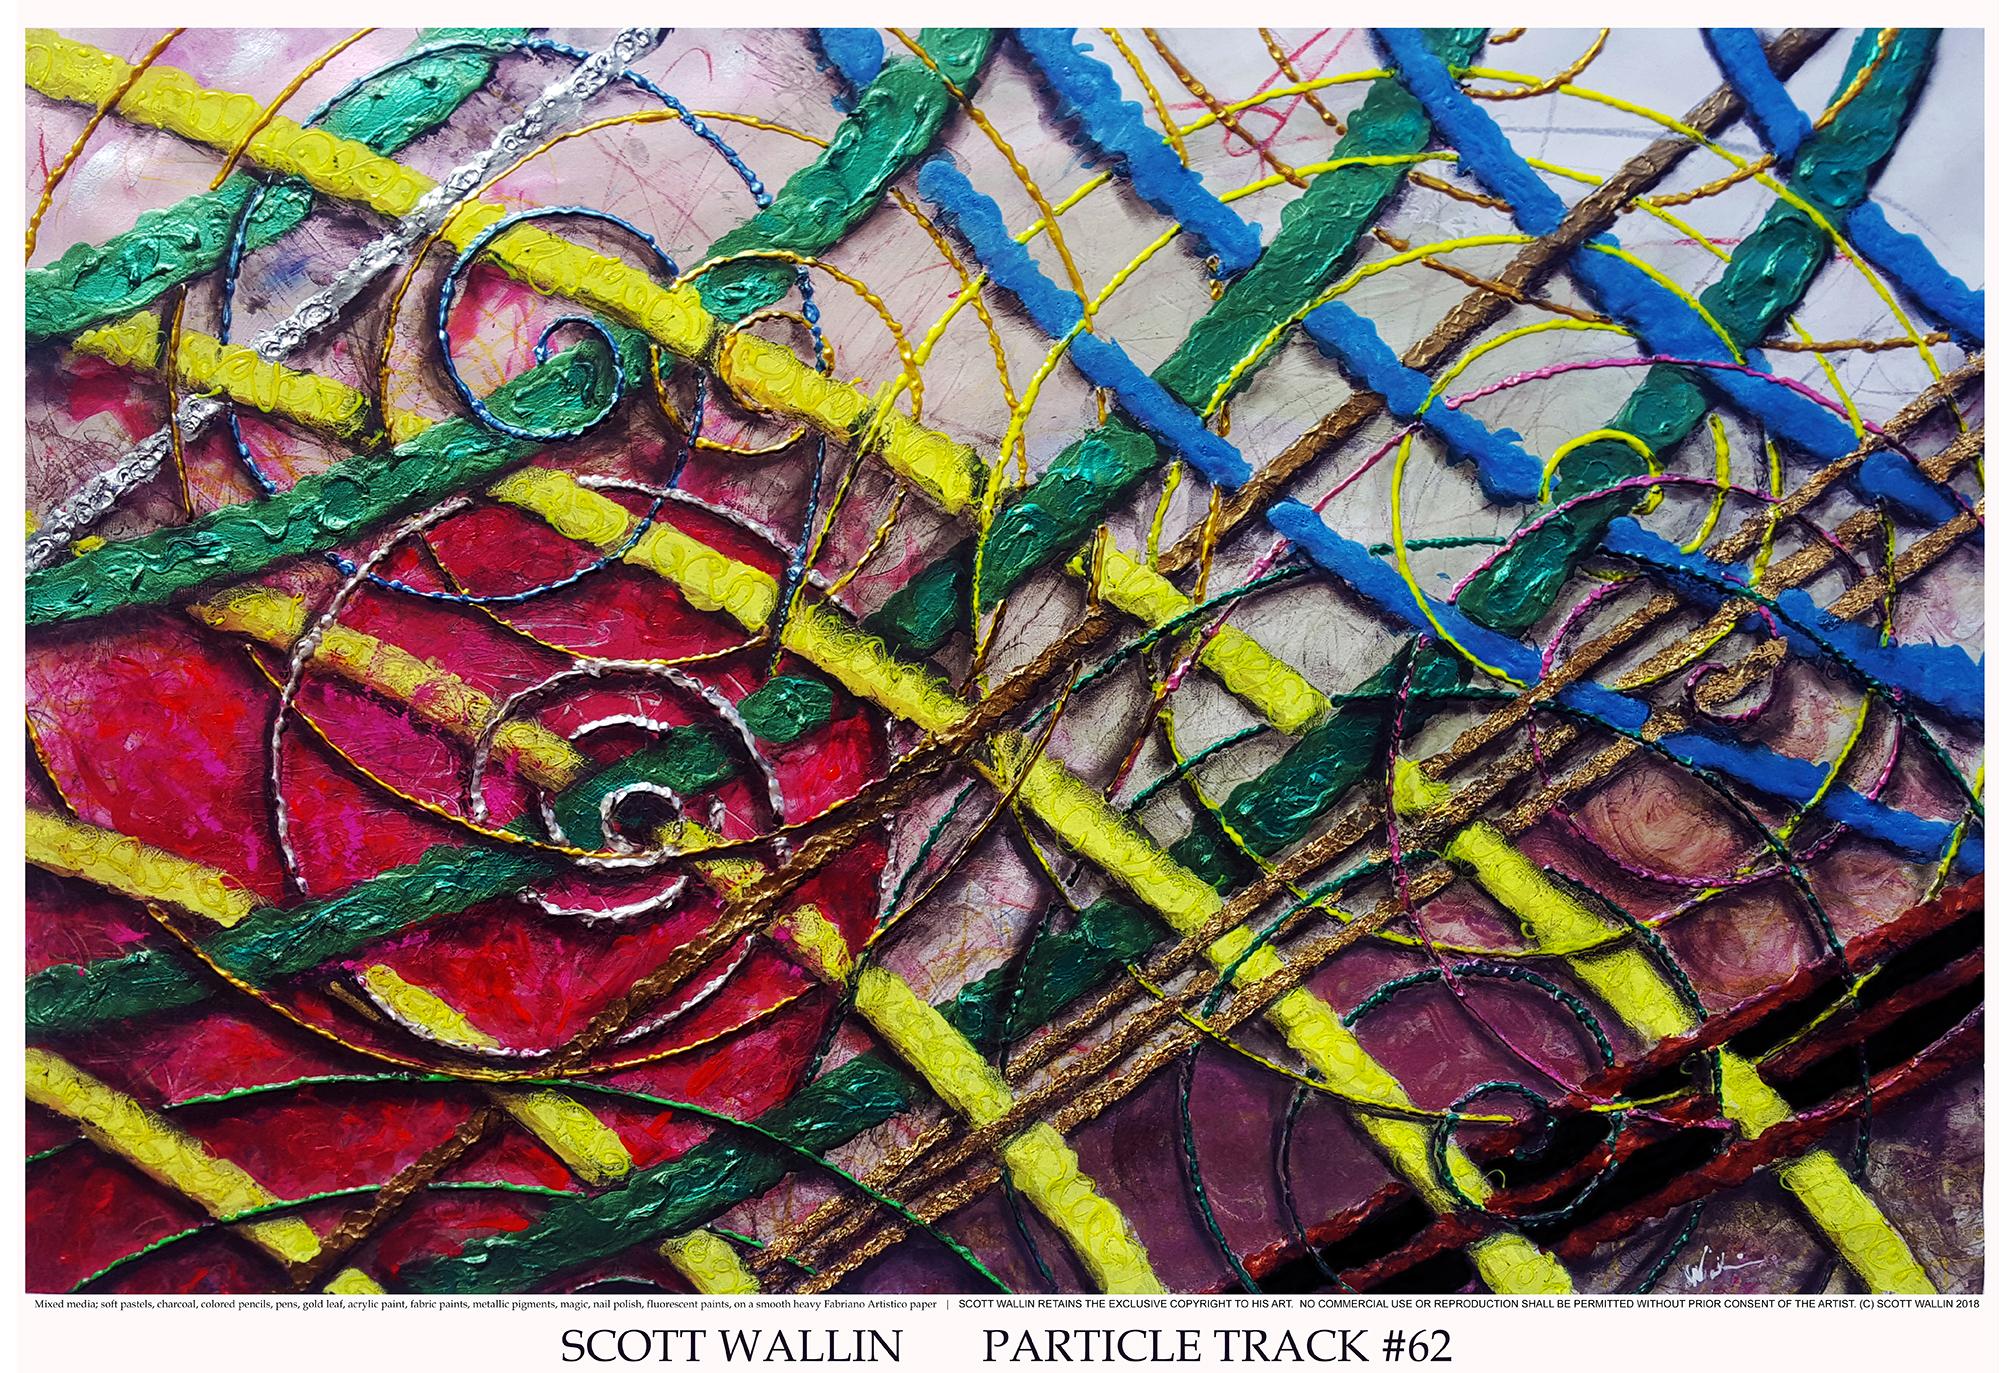 PARTICLE TRACK #62 (c)SCOTT WALLIN 2